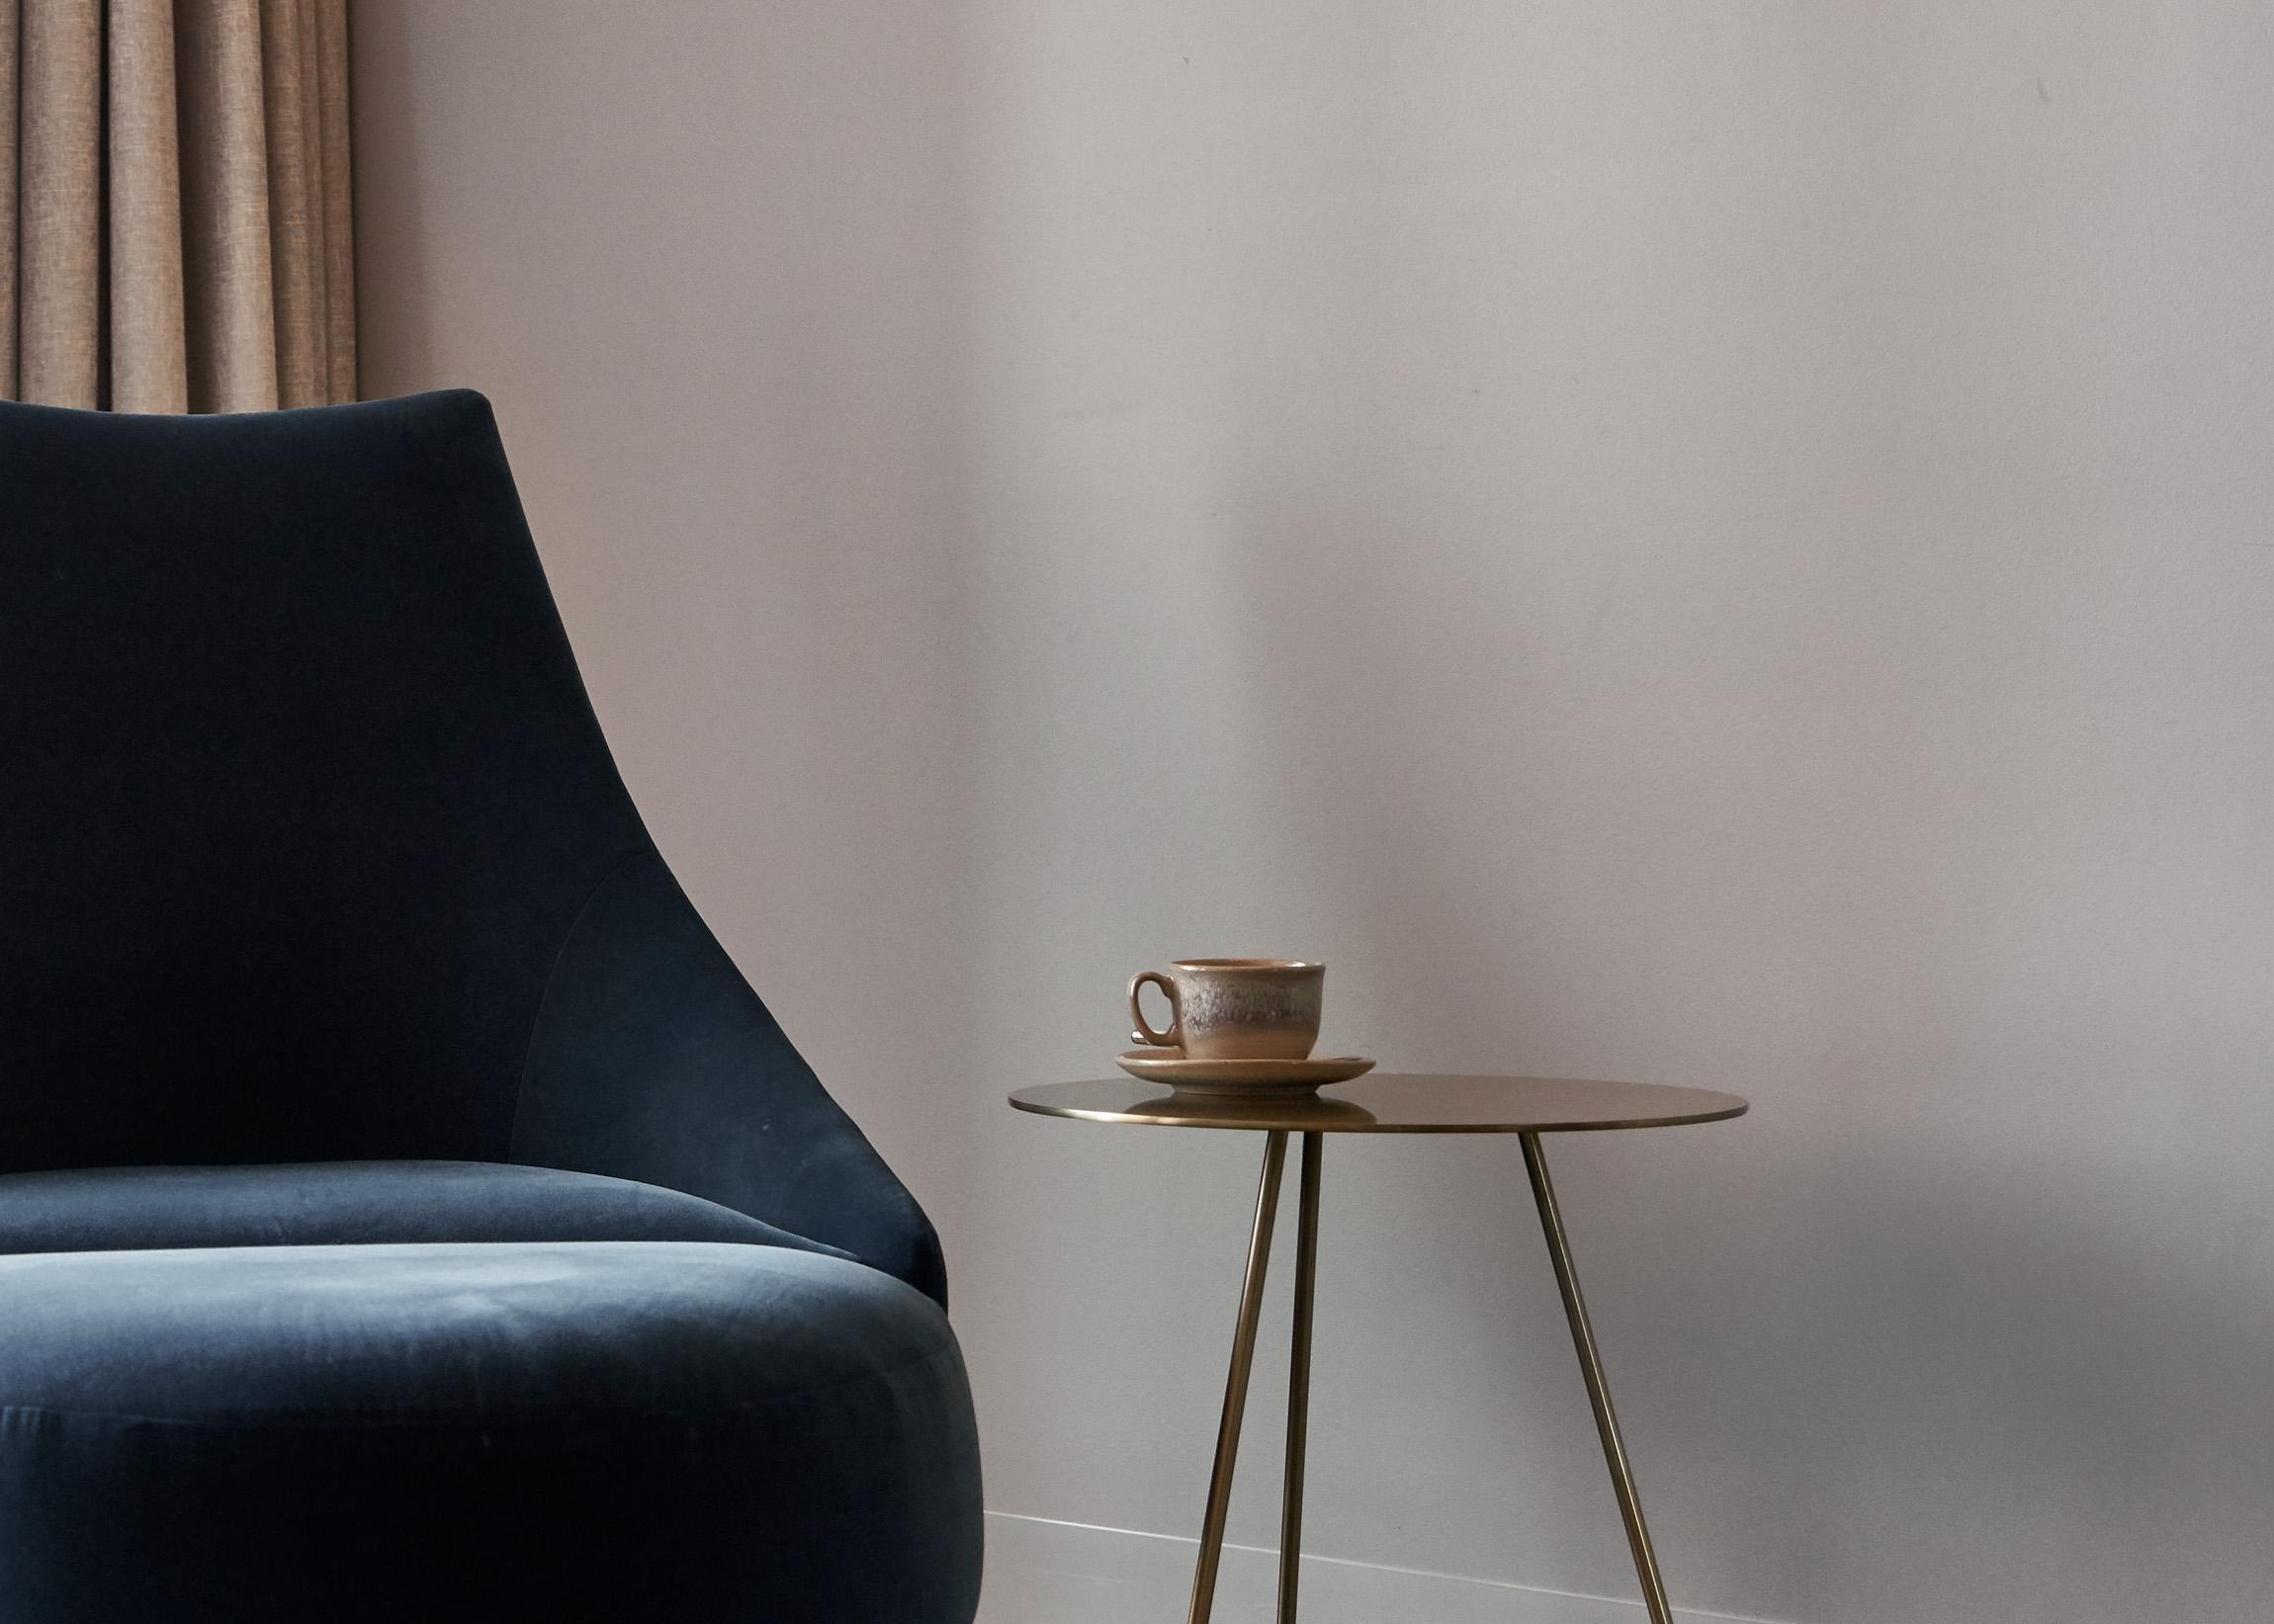 MINI Guide to Tasmania — MACq01 design hotel Hobart